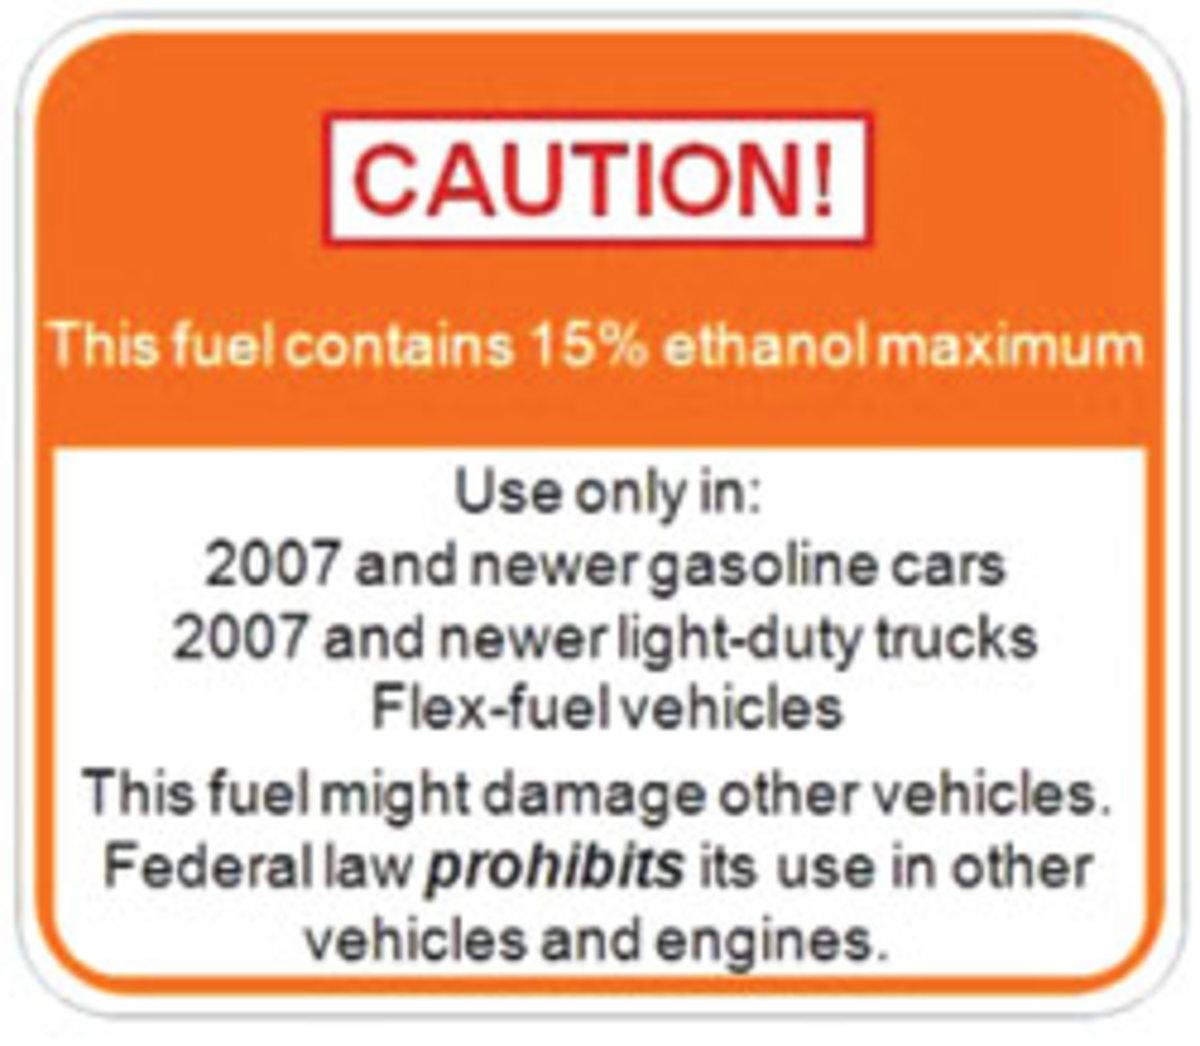 40_ethanol_01